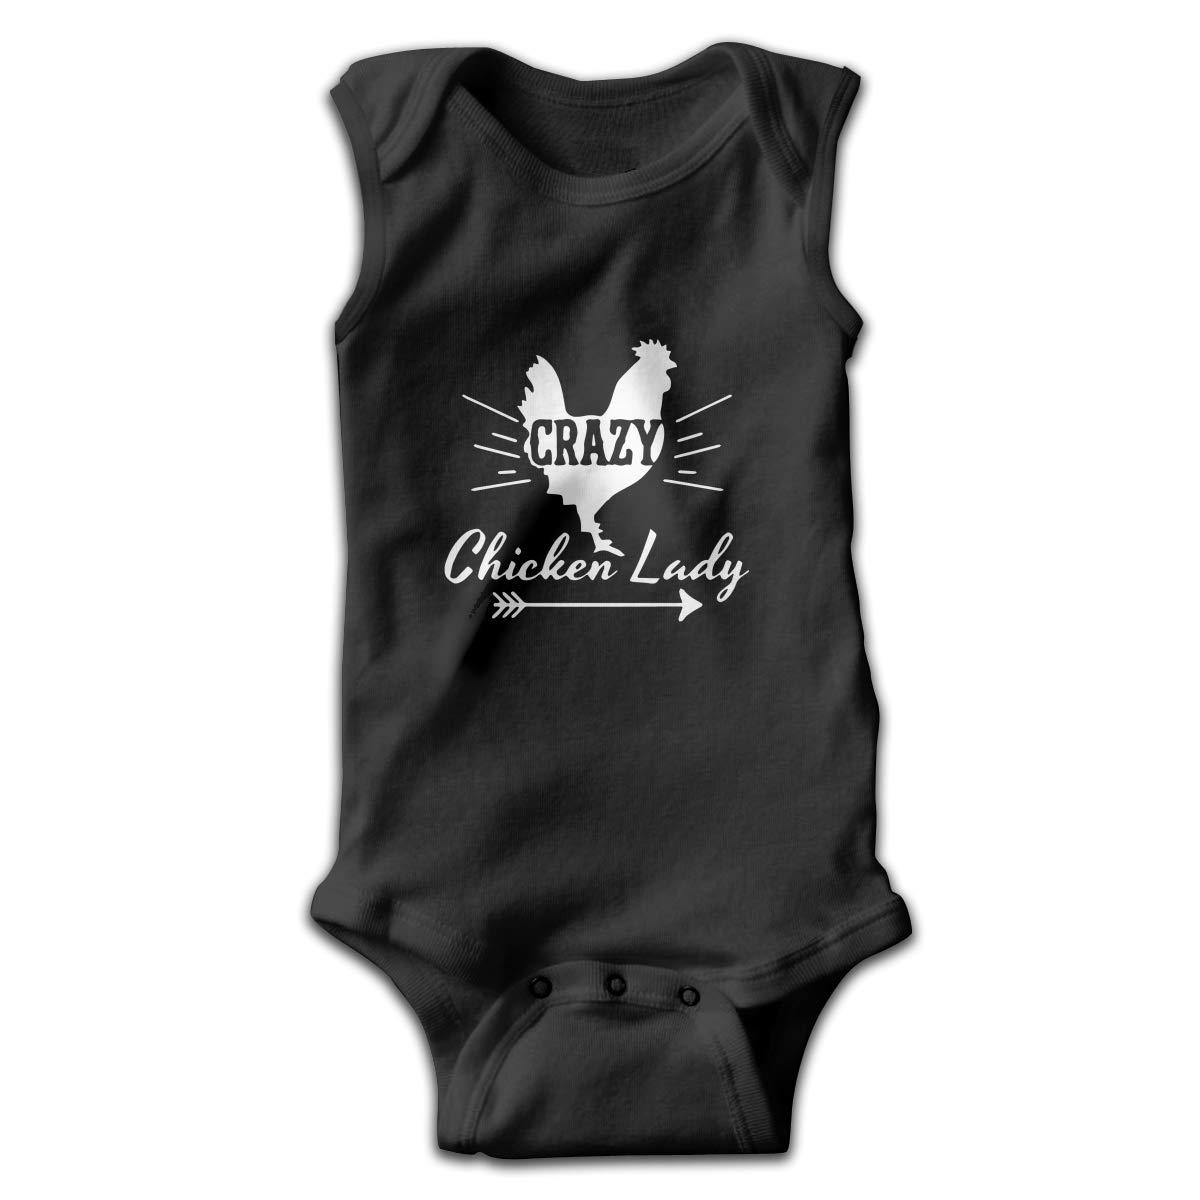 Dunpaiaa Crazy Chicken Lady Logo Smalls Baby Onesie,Infant Bodysuit Black